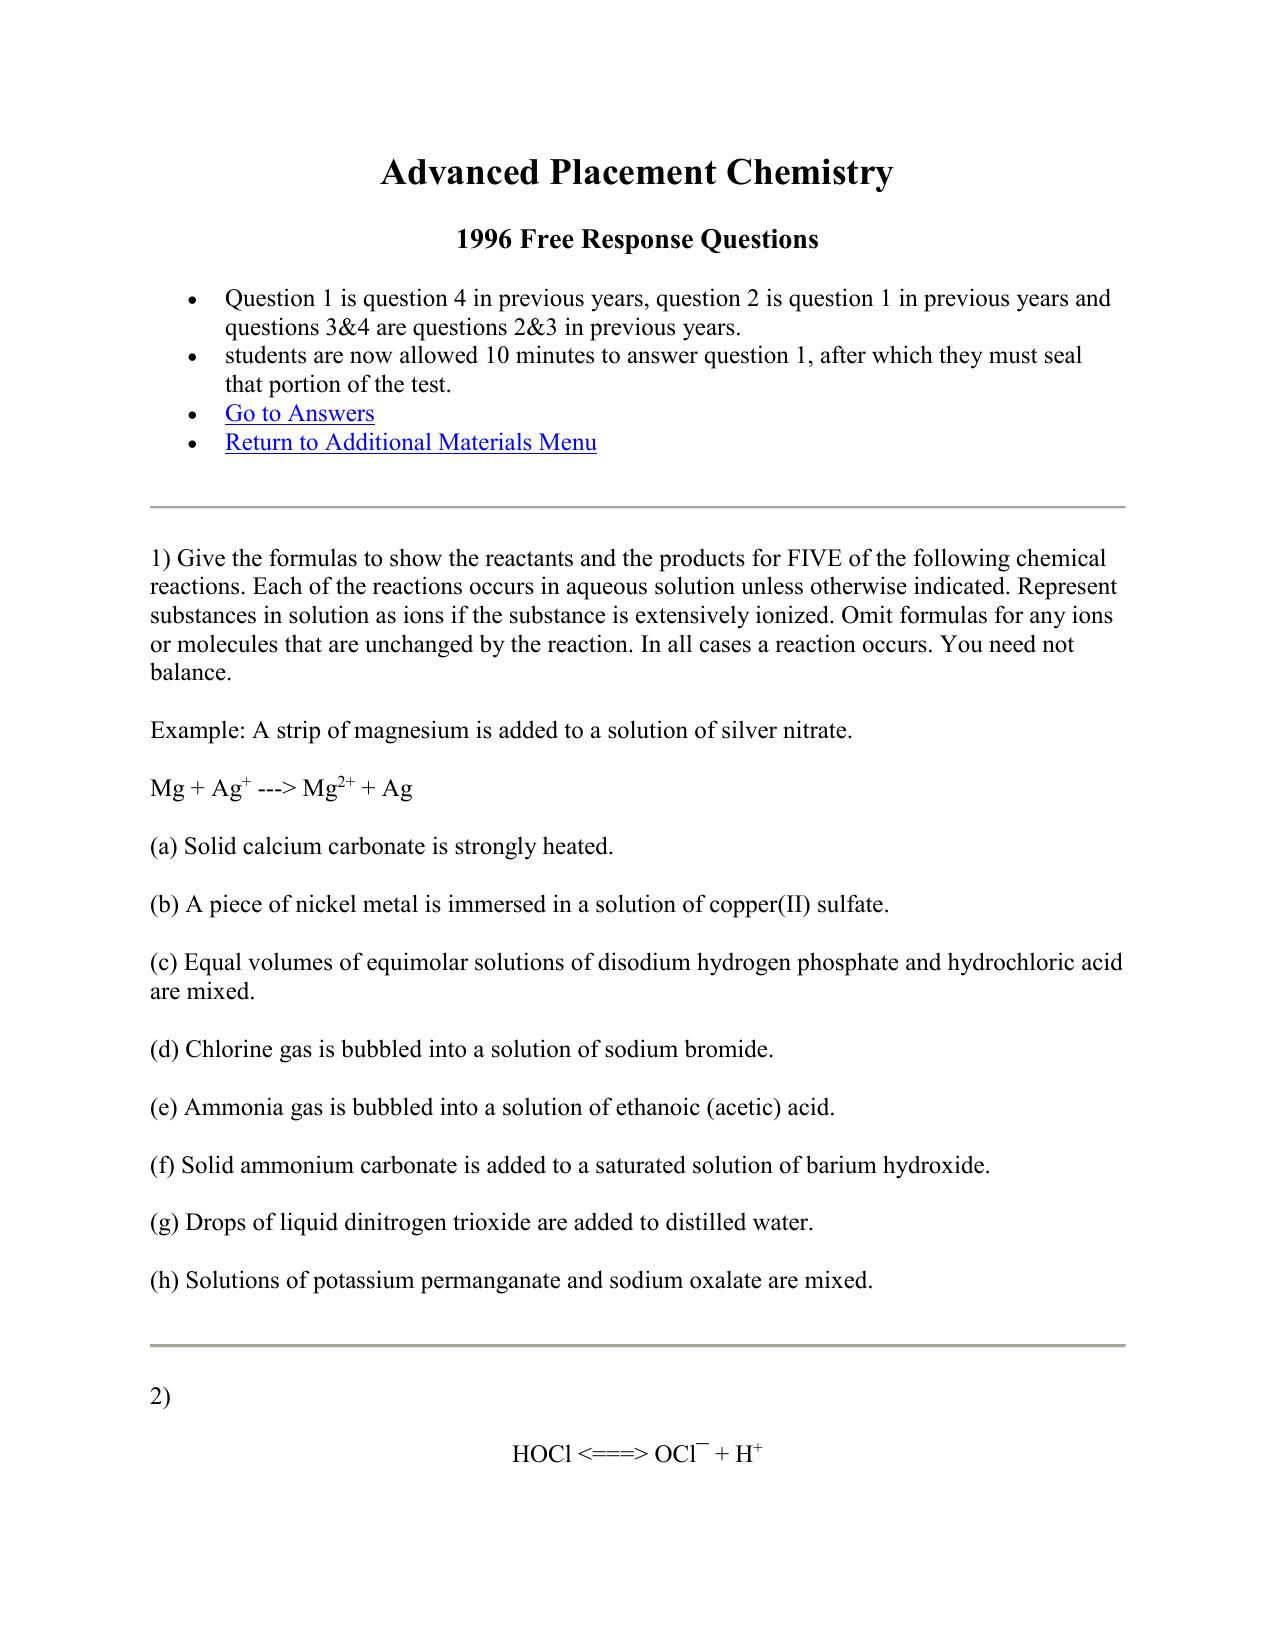 Cheap descriptive essay editing websites for university